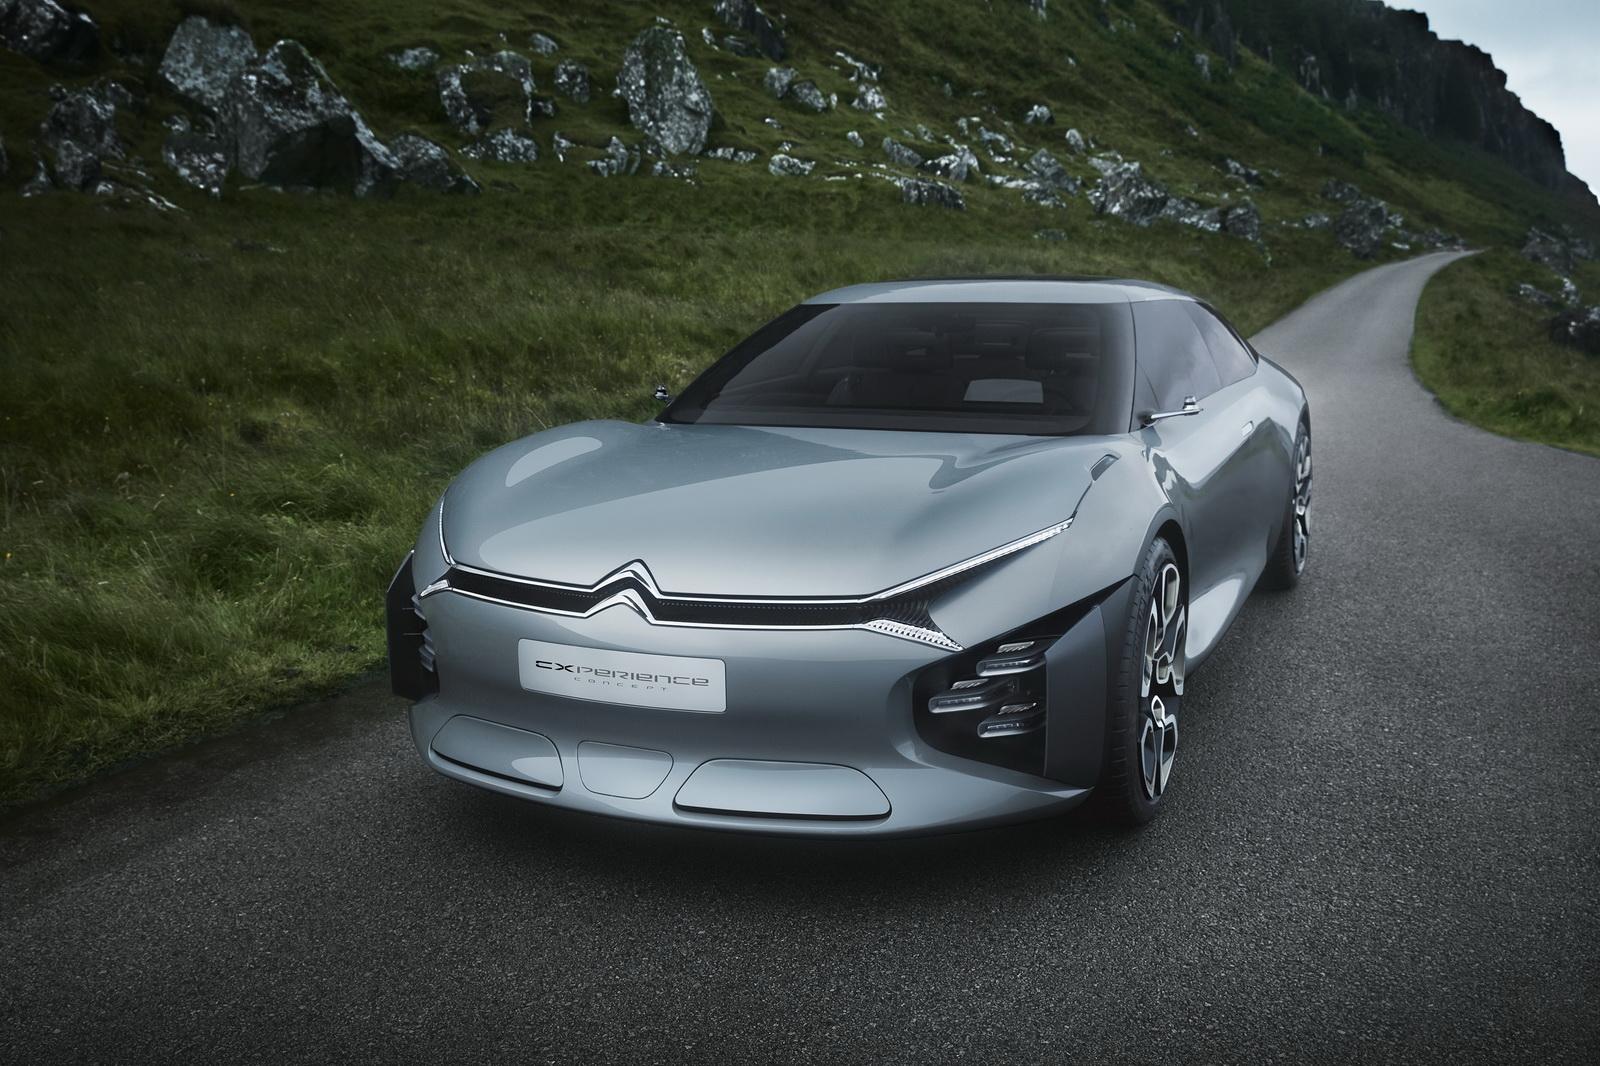 All New Vellfire 2020 Harga Mobil Grand Avanza 2015 Citroen C5 Coming In Says Companys Boss